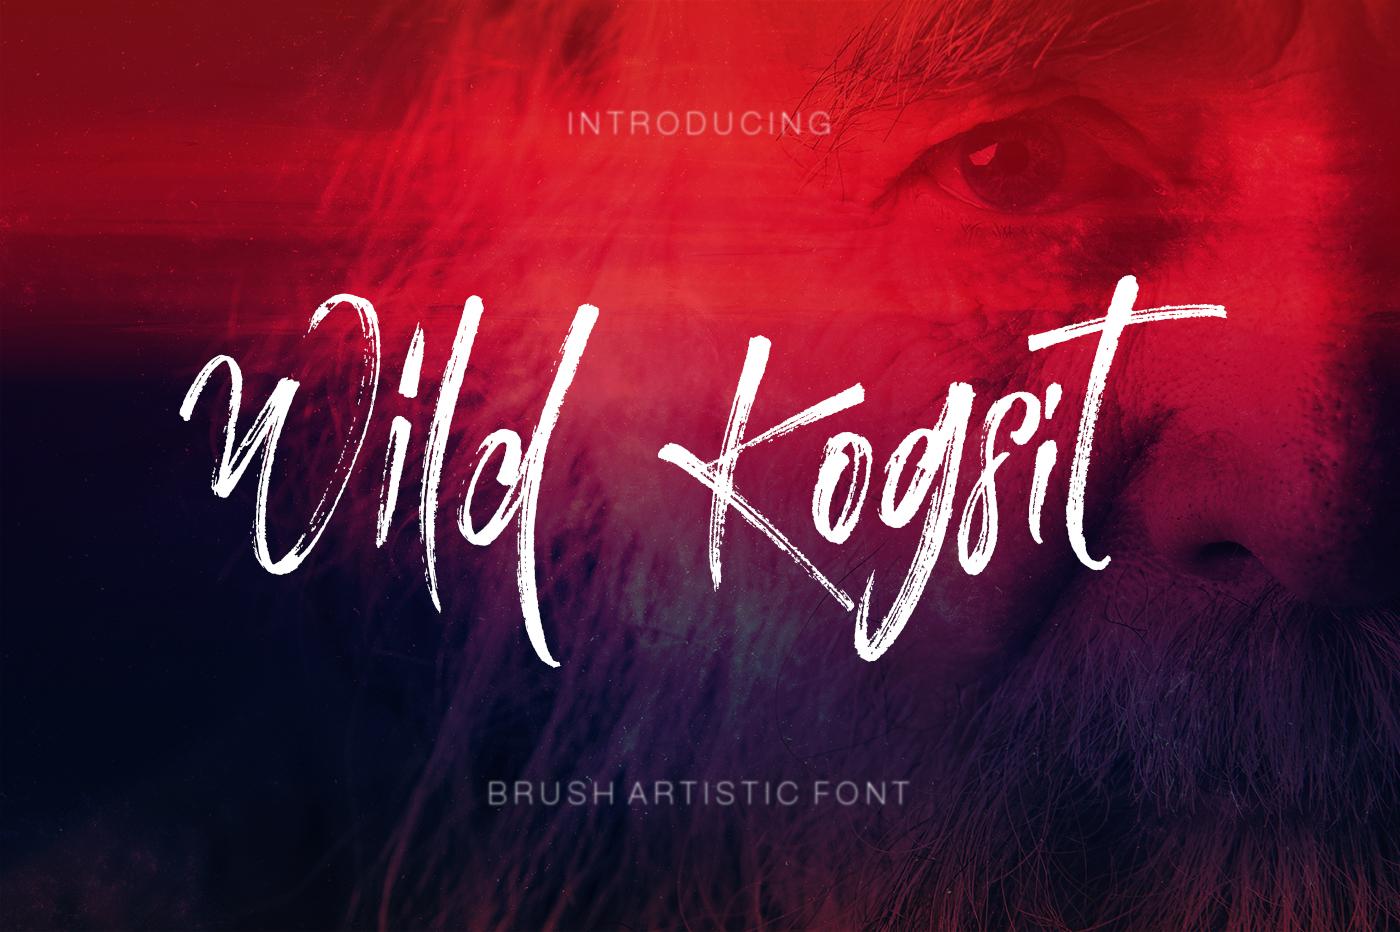 Wild Kogsit Artistic Script Font example image 1